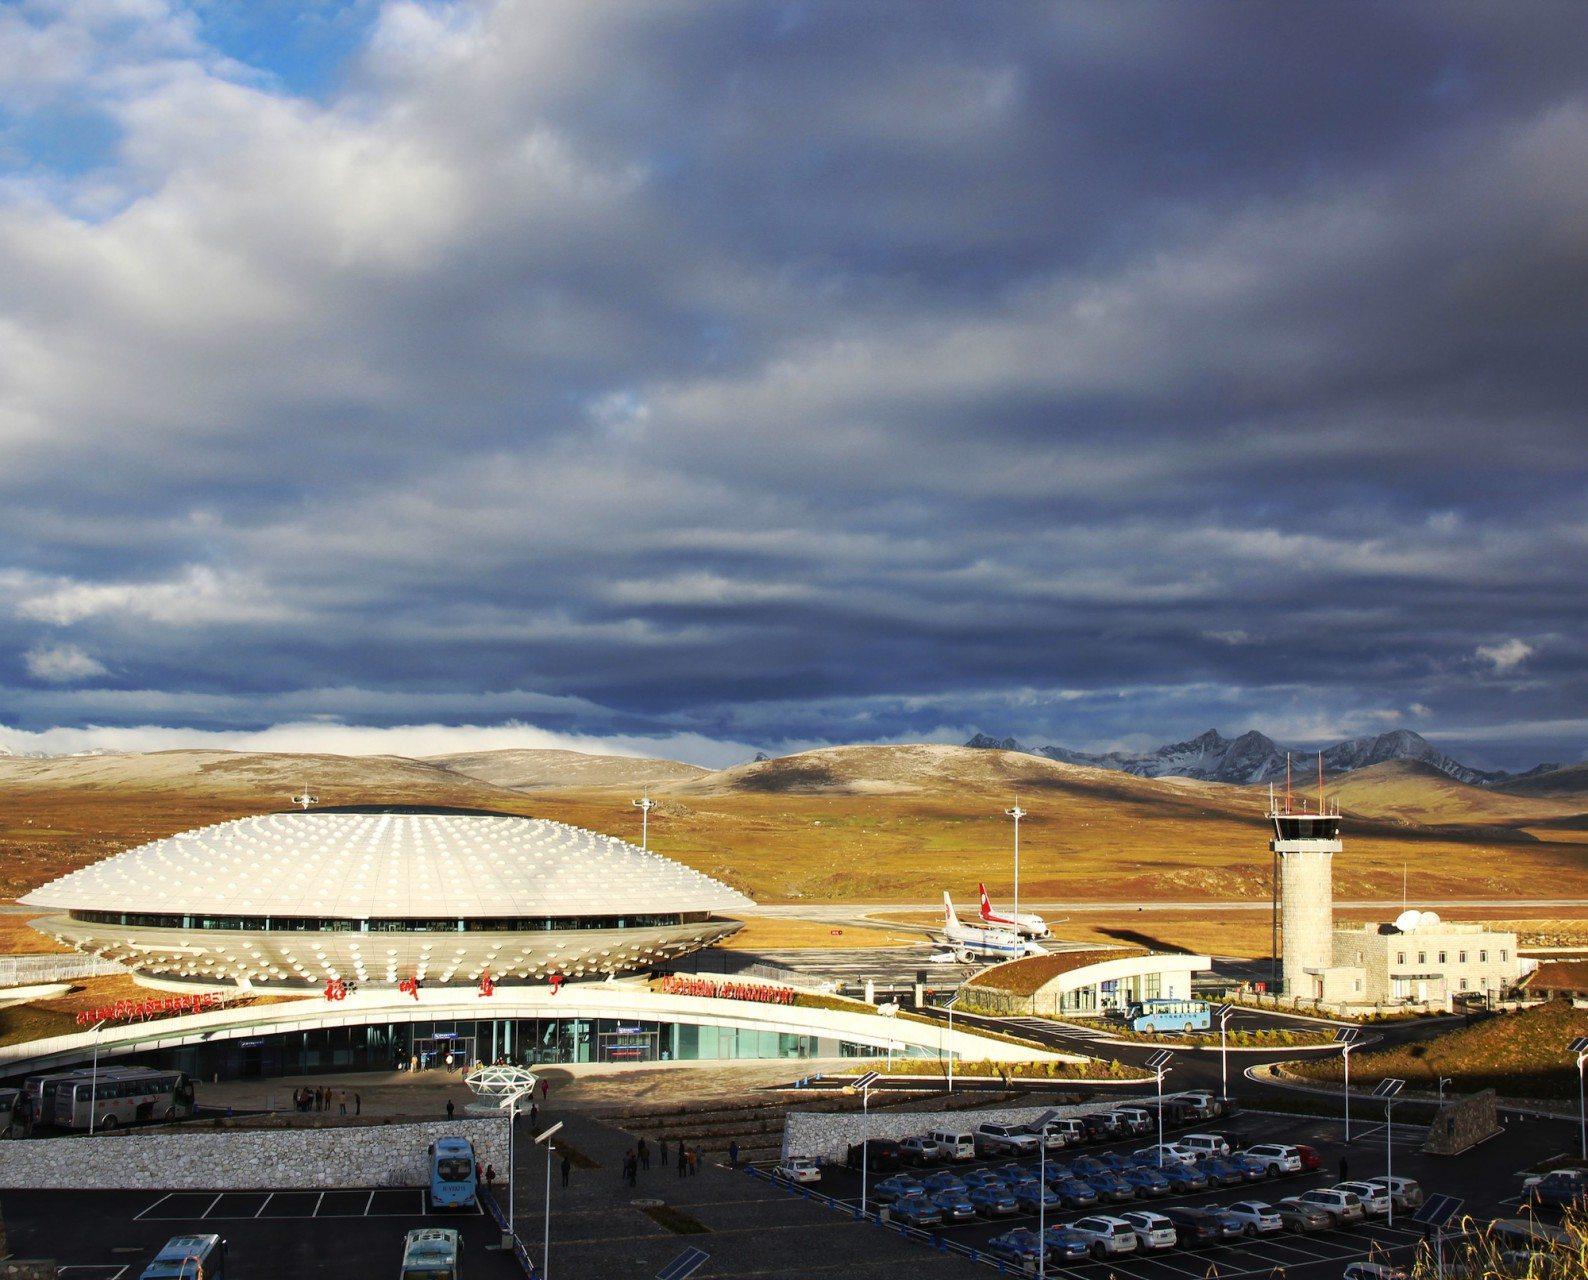 DCY.  Daocheng Yading Airport, Sangdui, Tibet. Von GUD Group.